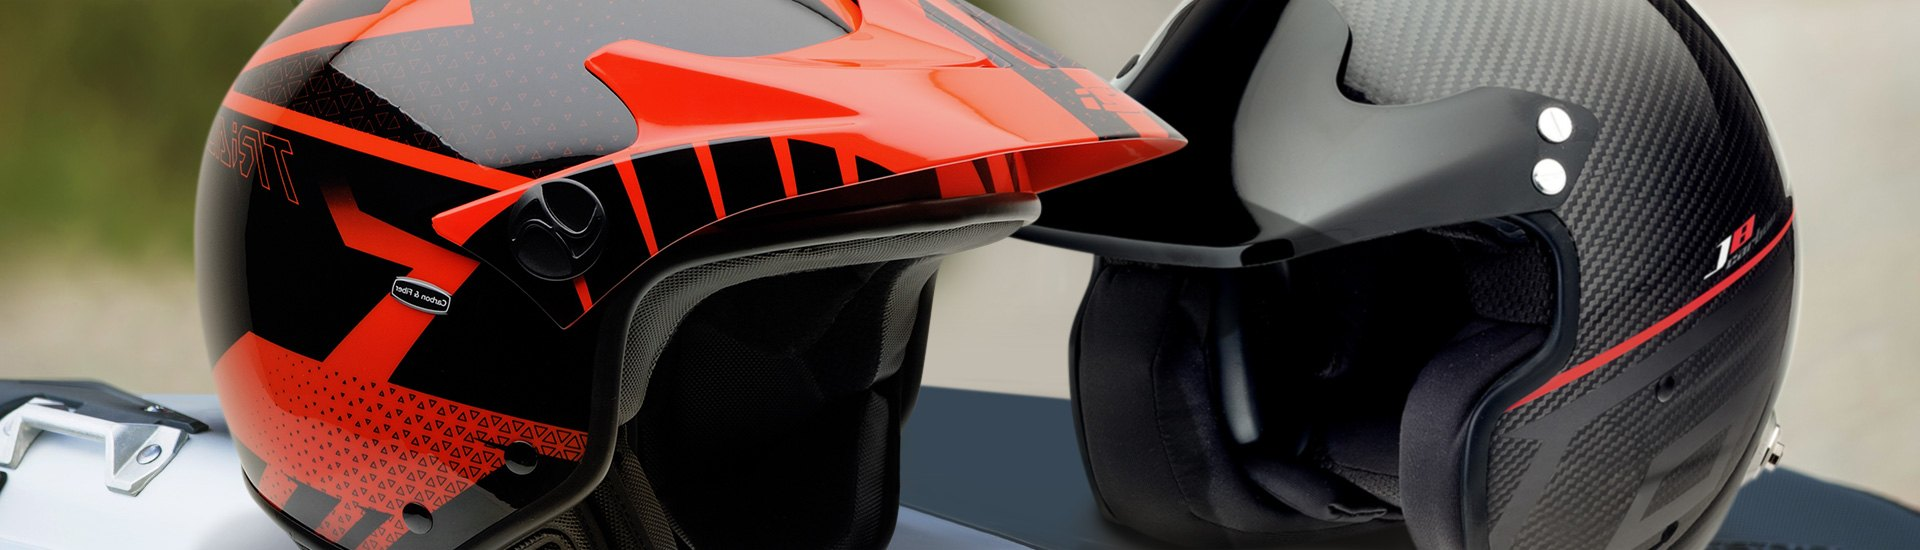 3da2c62d Open Face Powersports Helmets | ATV, UTV, Snowmobile – POWERSPORTSiD.com